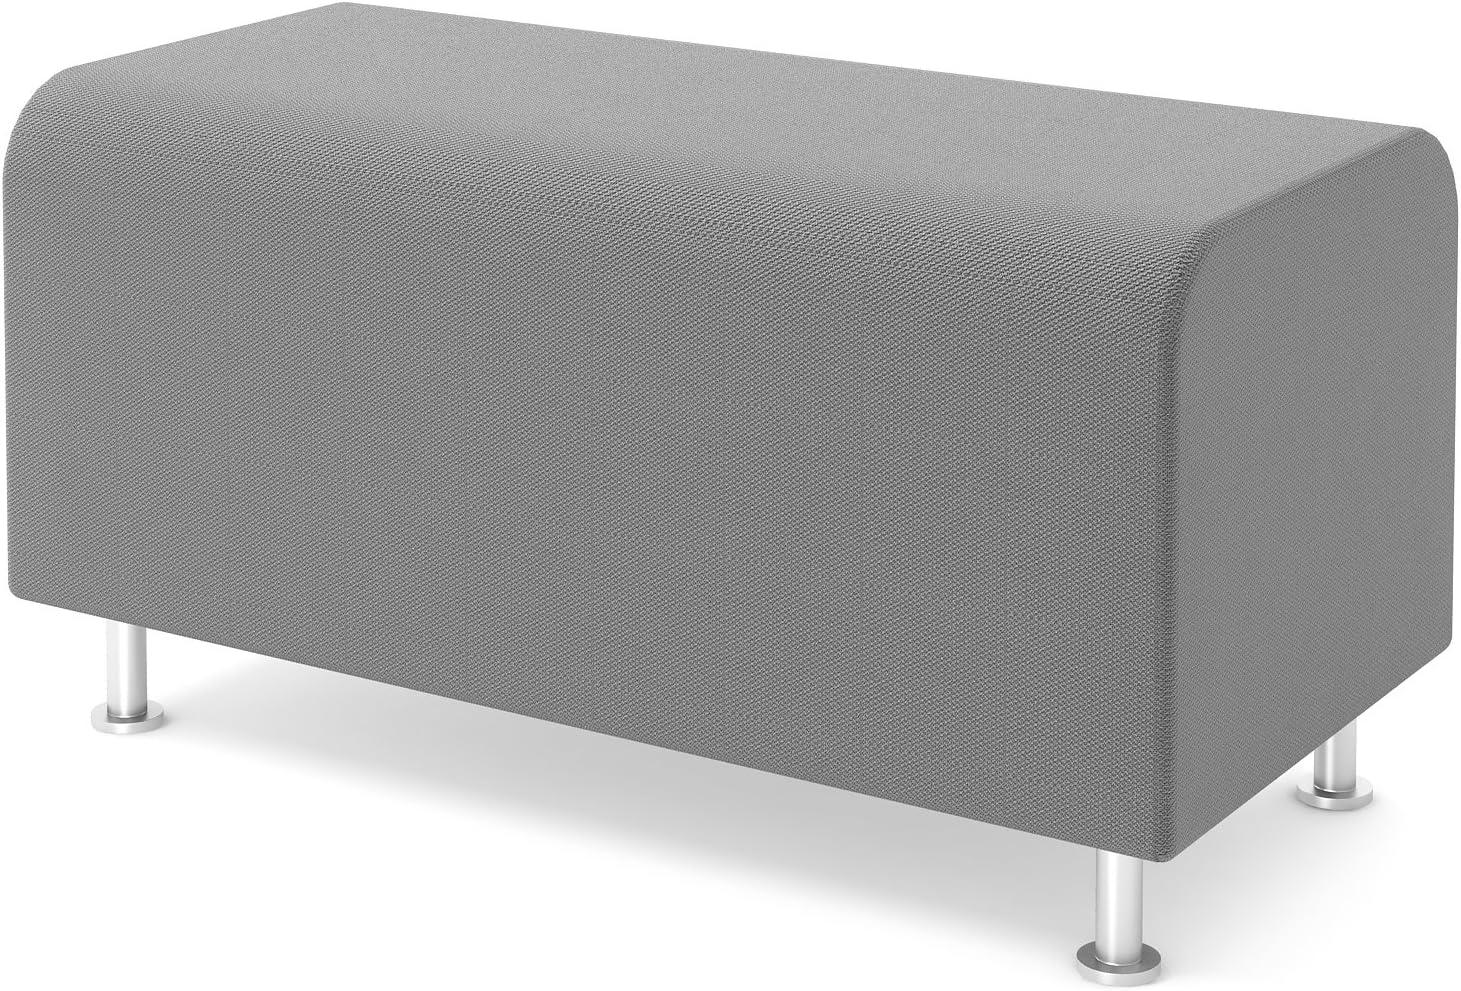 Black Fabric TS34403 Steelcase Turnstone Alight Bench Ottoman